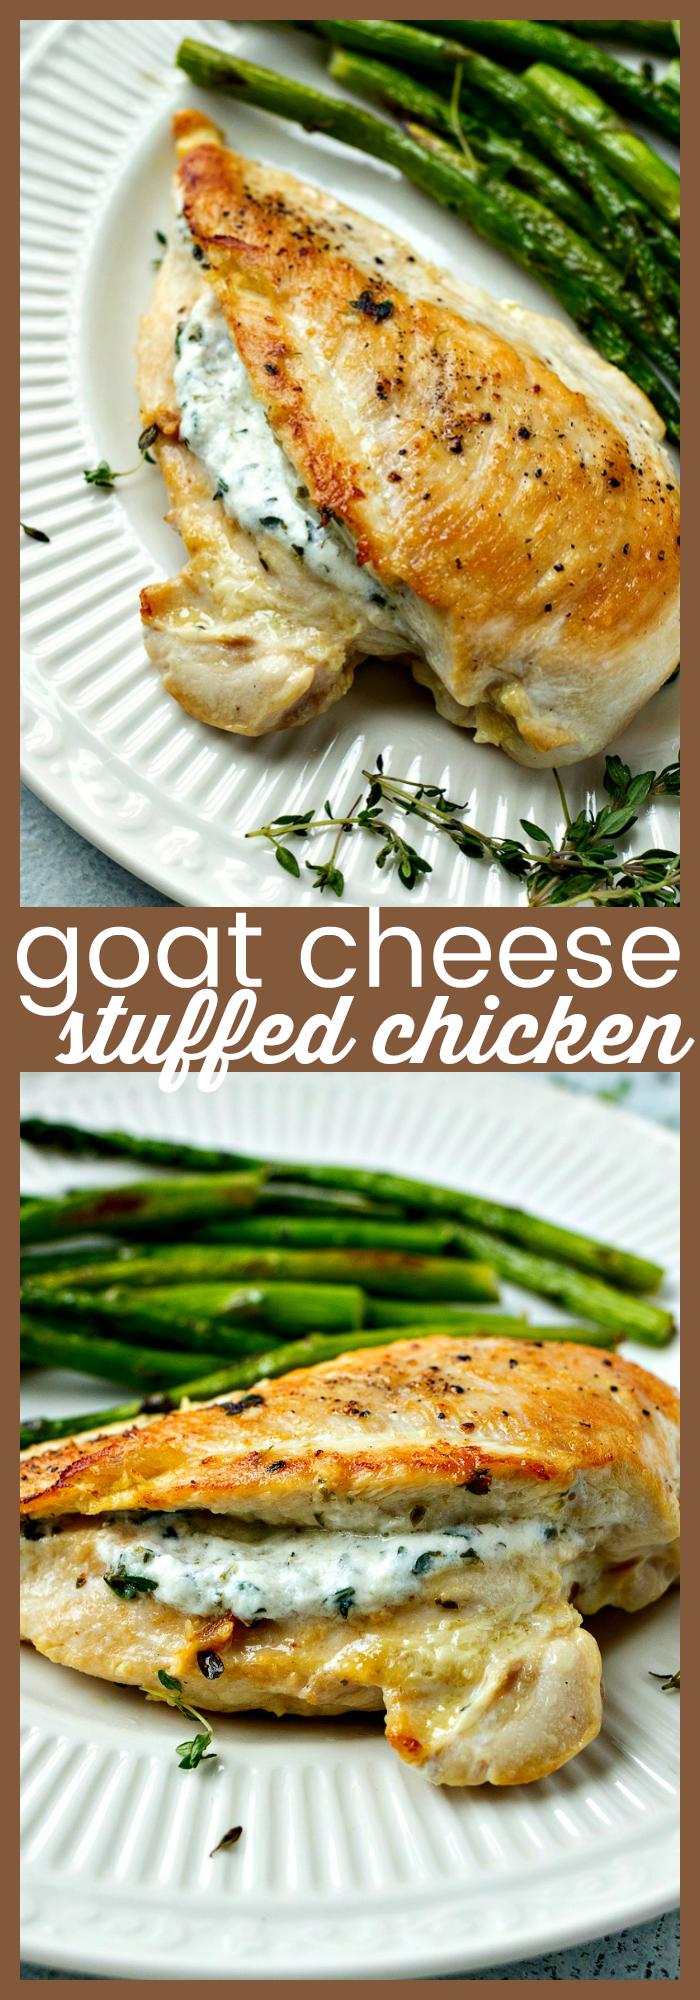 Goat Cheese Stuffed Chicken